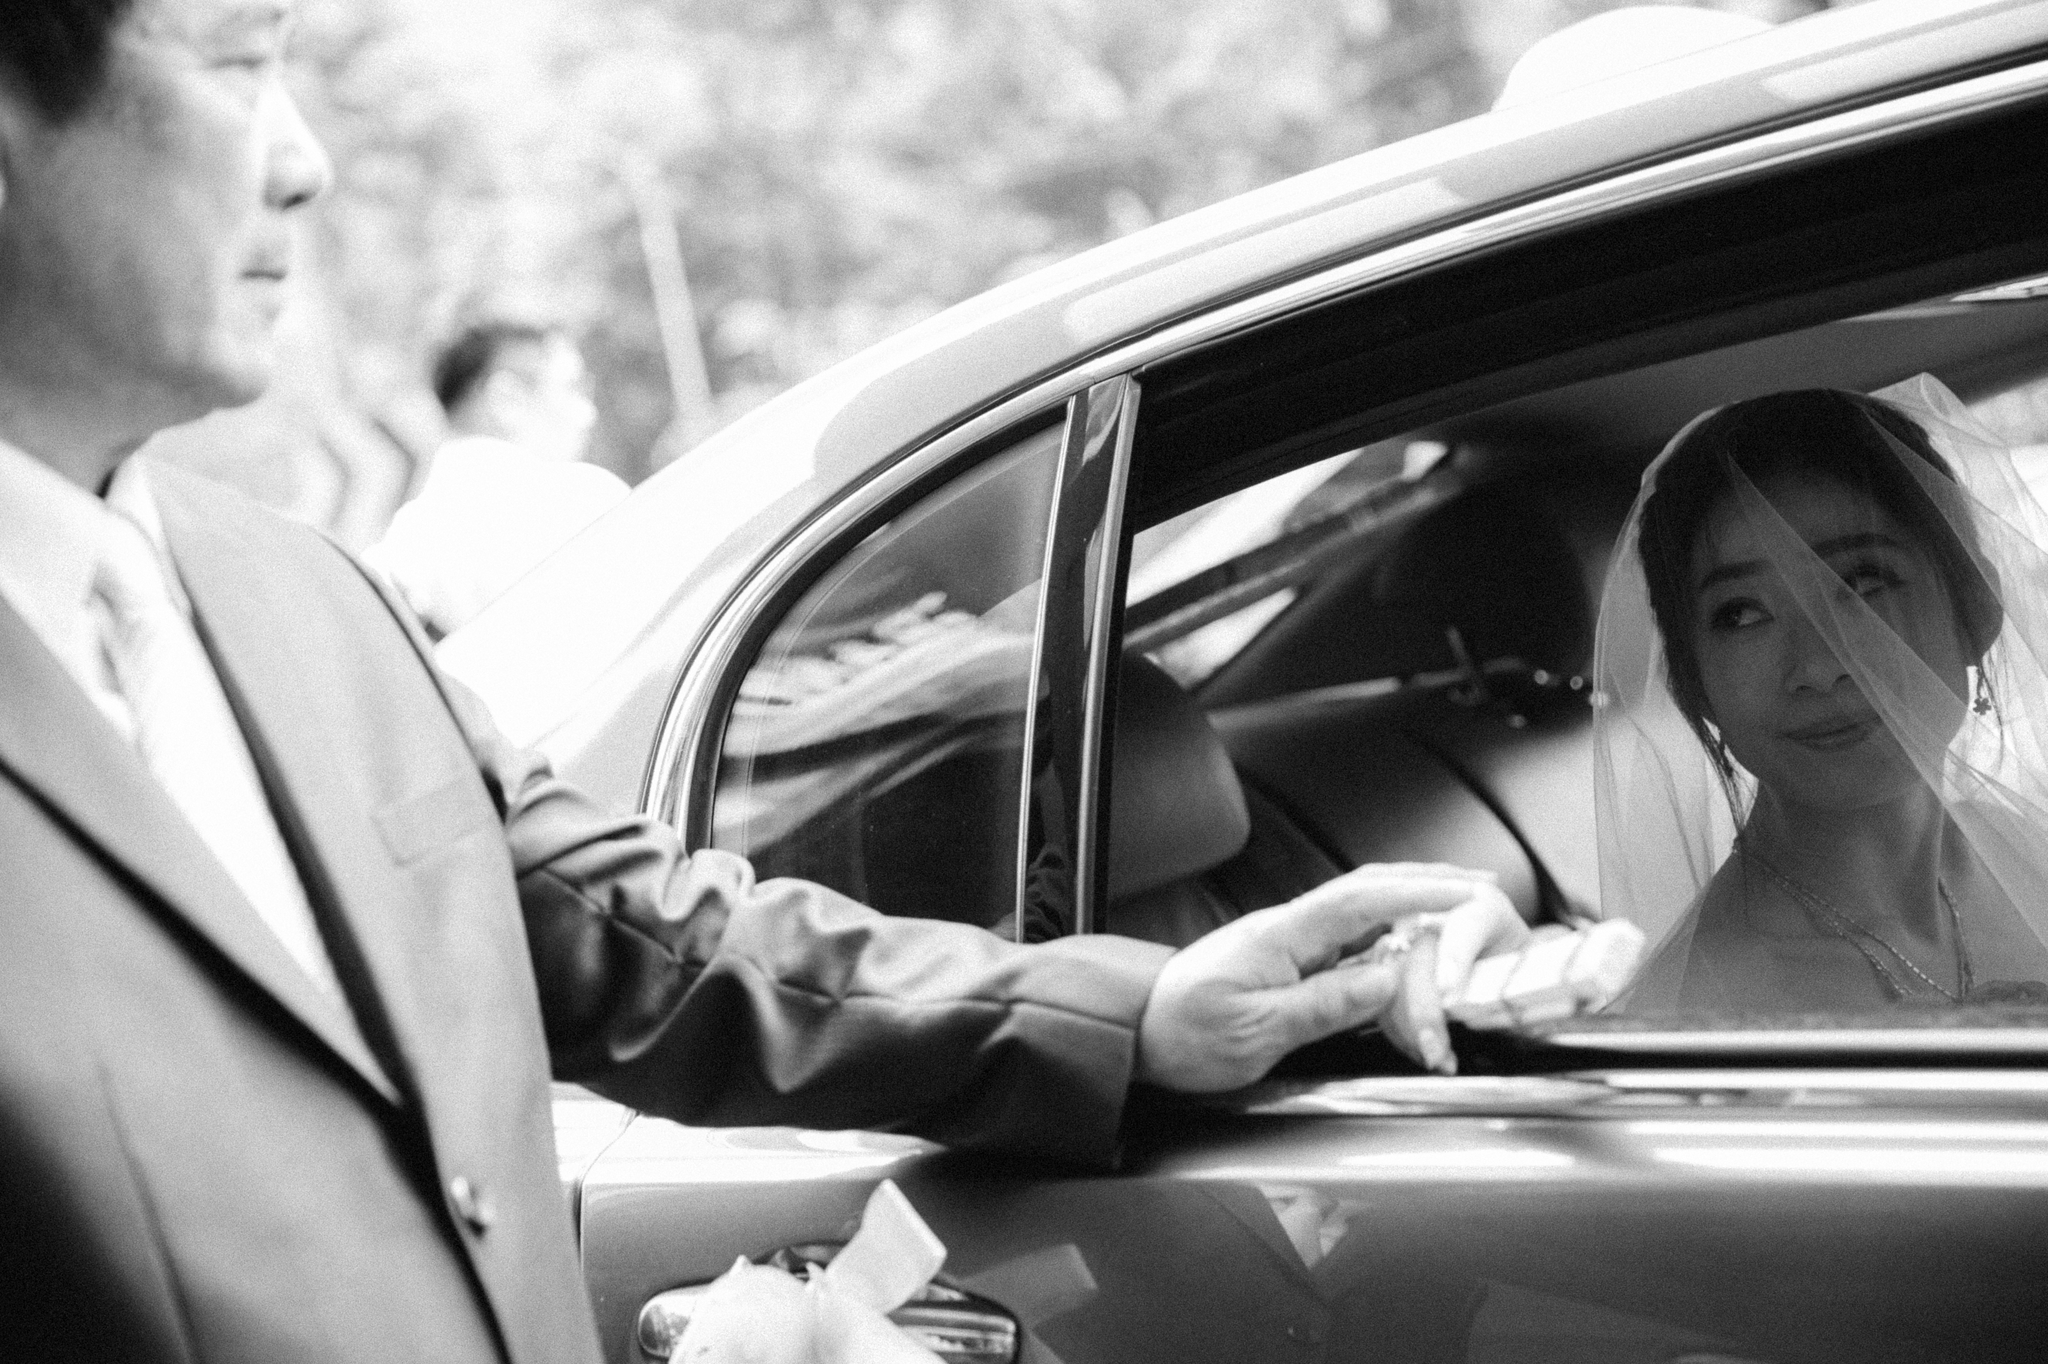 Tina+Nash-wedding-台北婚禮迎娶晚宴-新莊終身大事-077.jpg